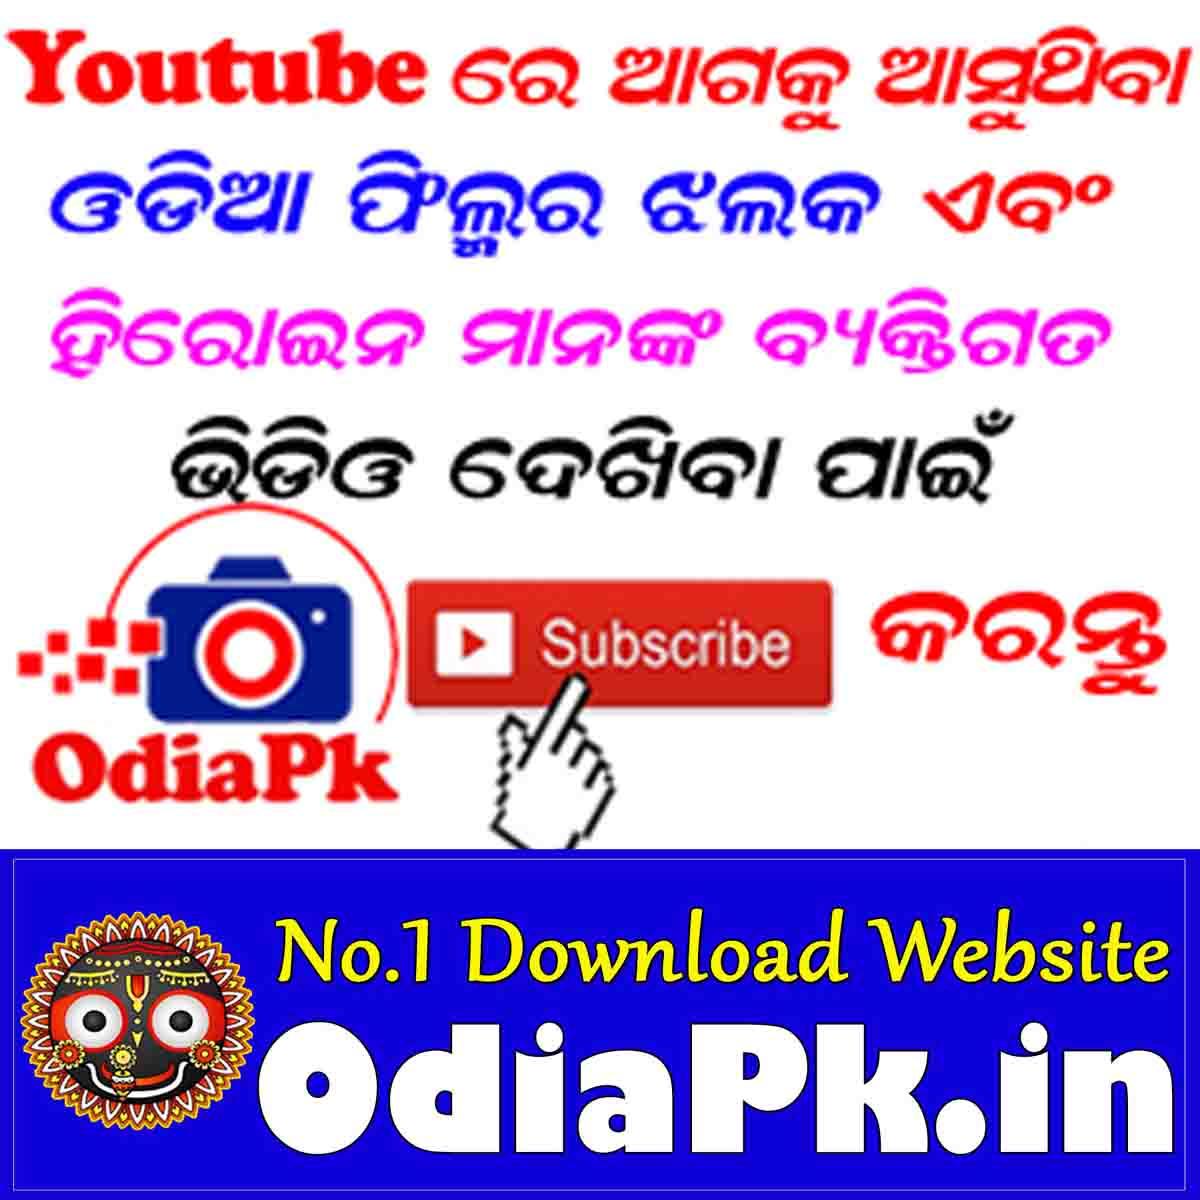 Pagala Bhanra Mu loTu Phagu Rani Prema Barnabodha Humane Jyotirmayee Ringtone